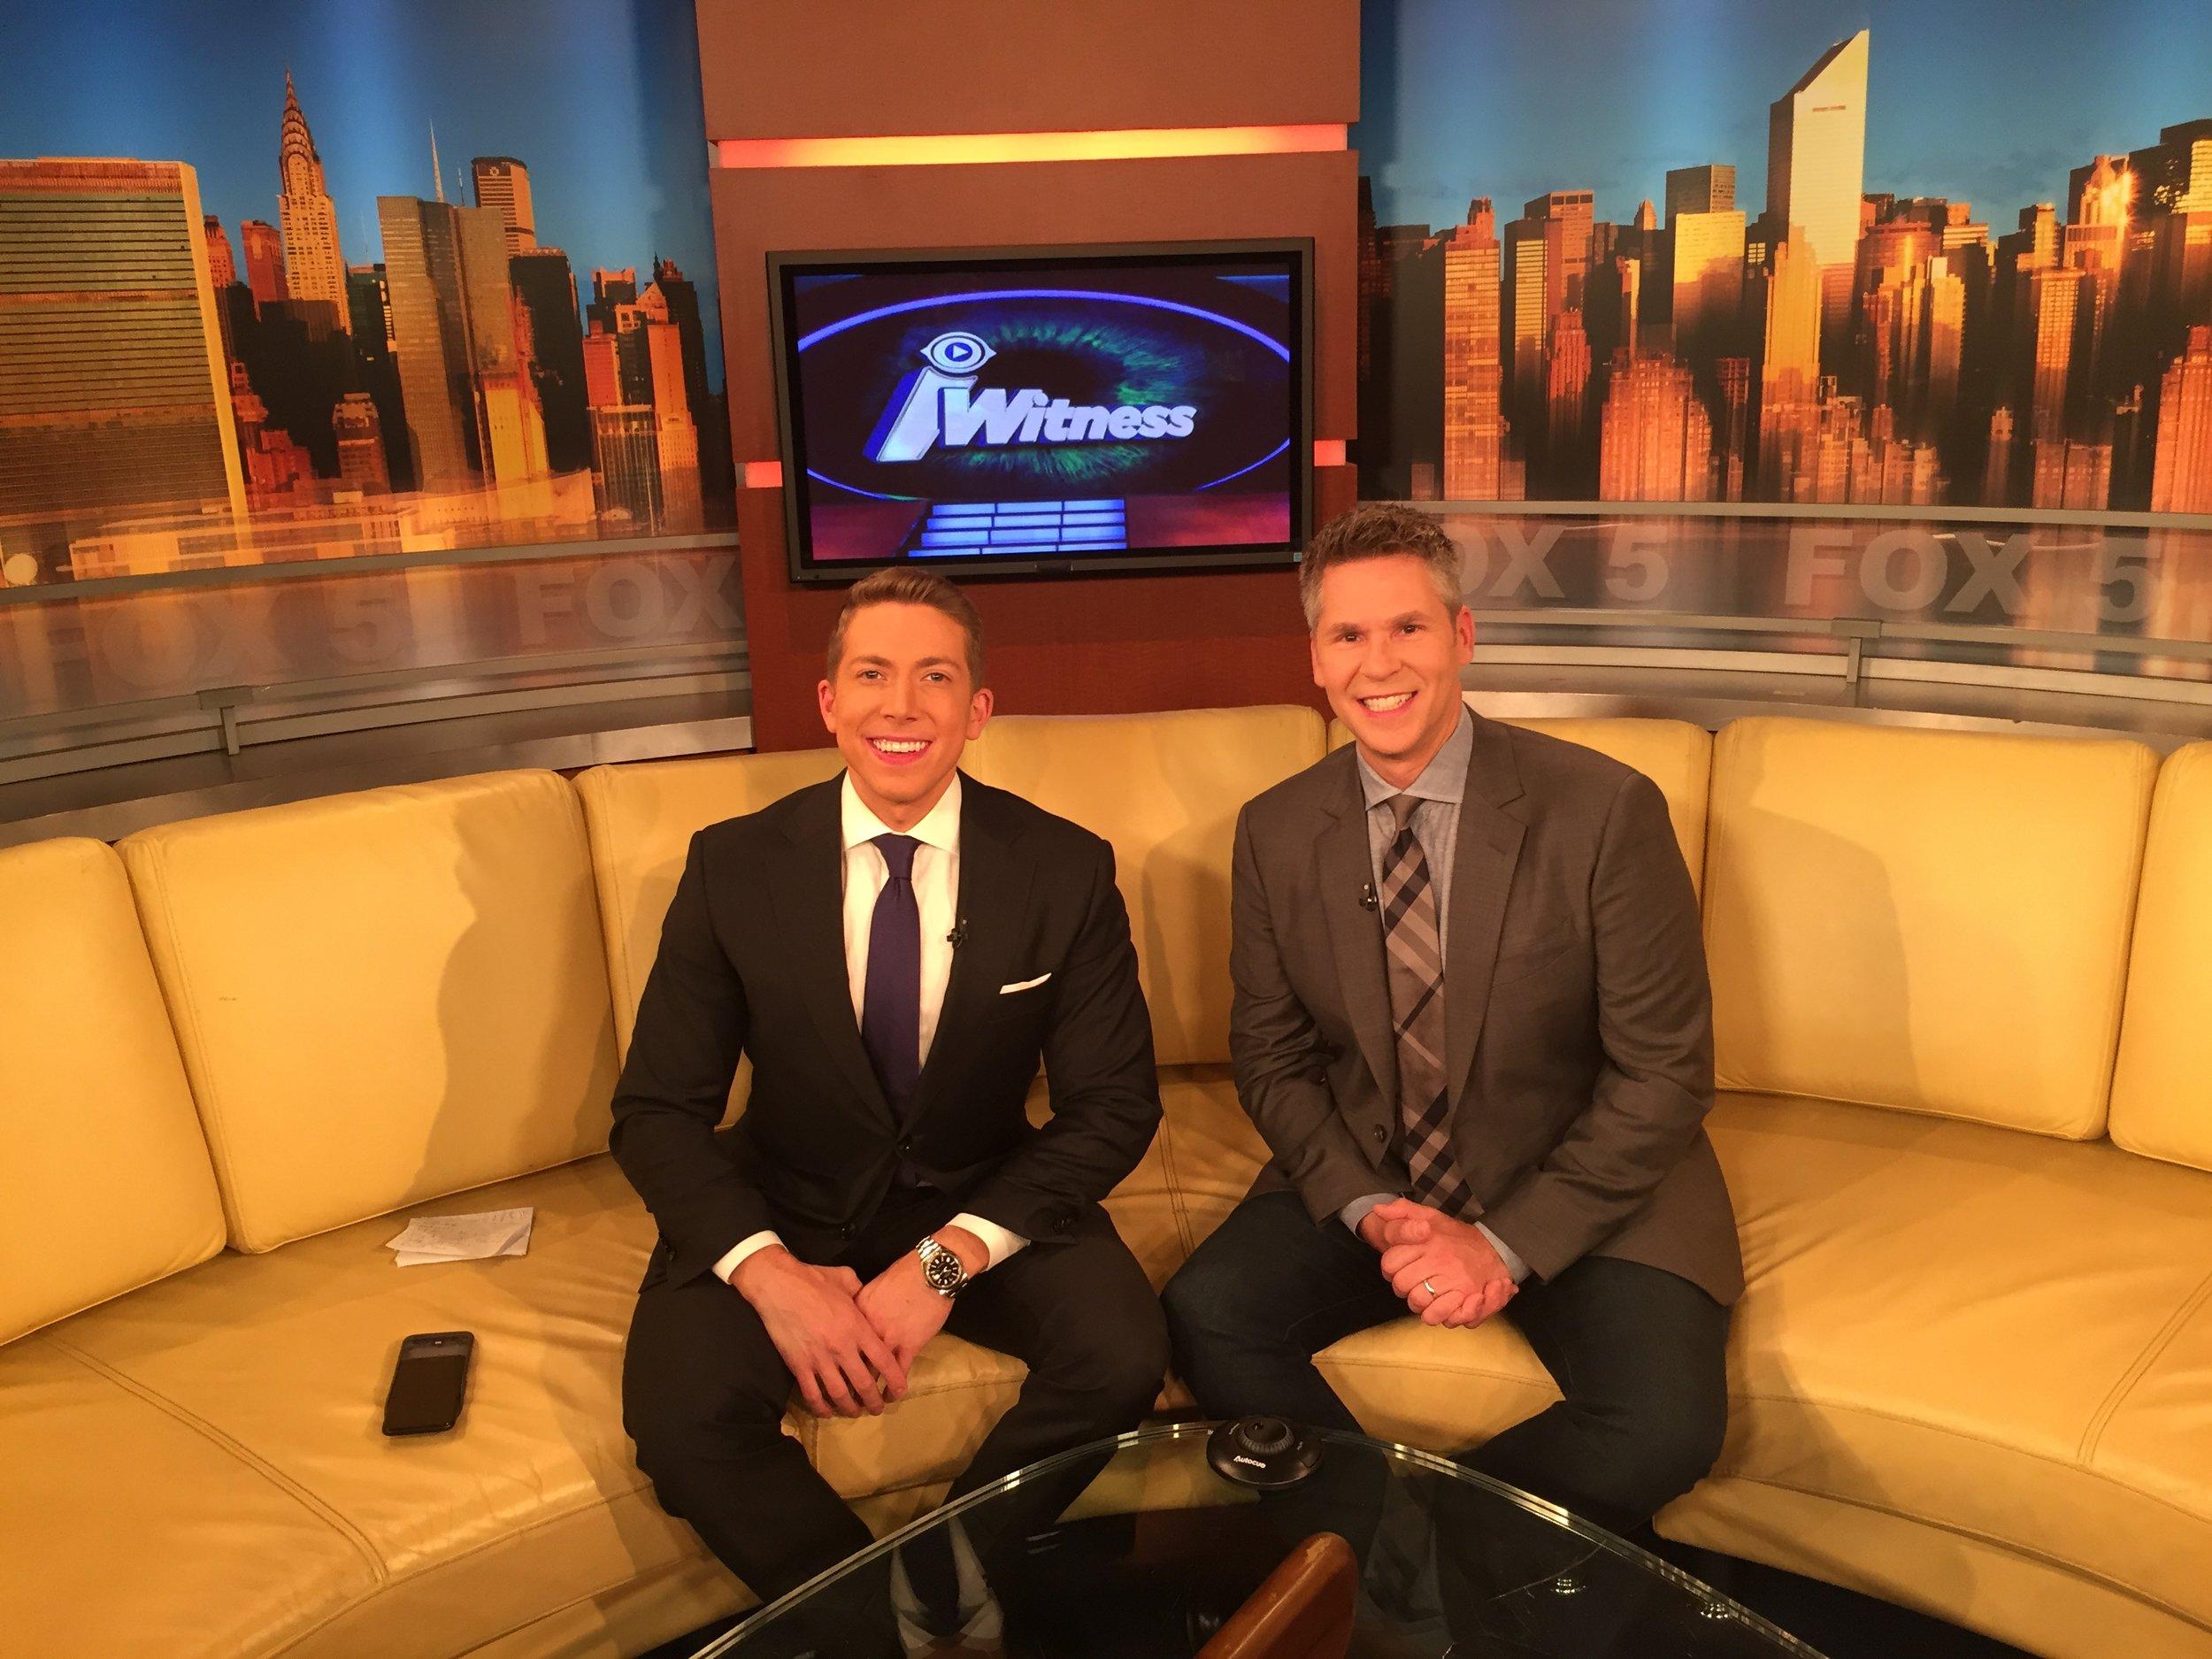 FOX's Baruch Shemtov and iWitness Host John Henson